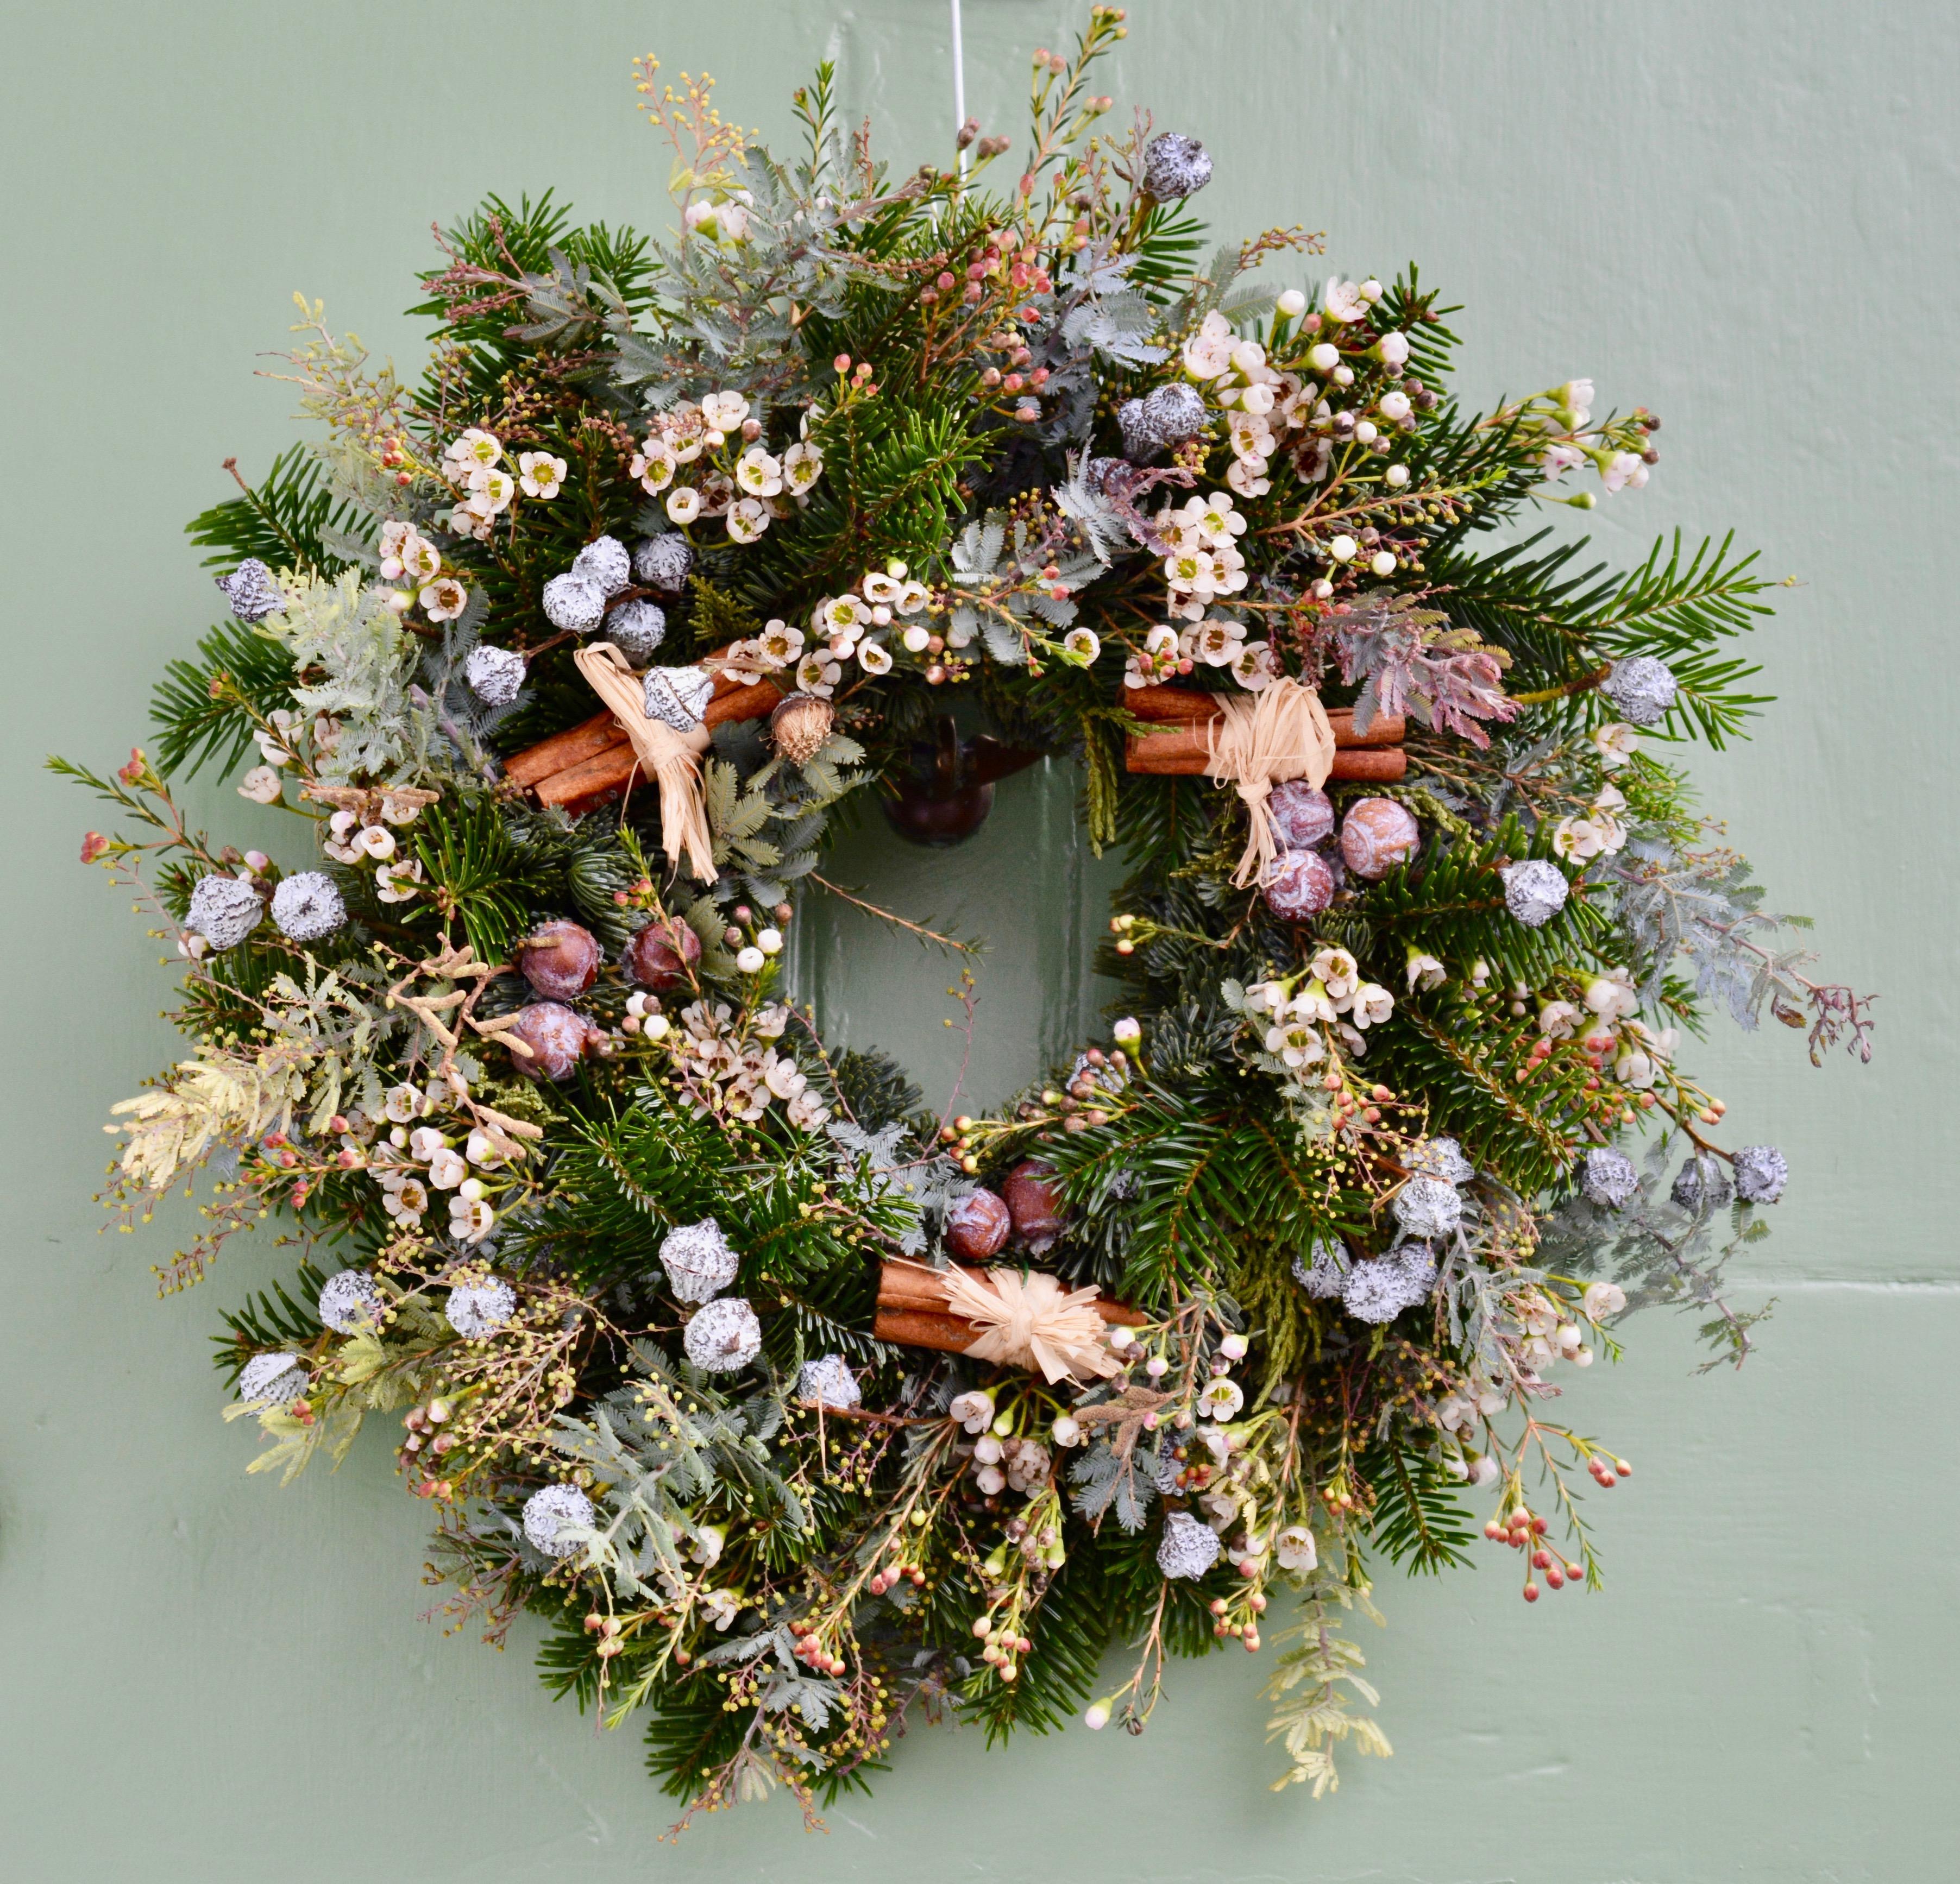 The Bowden Christmas Wreath